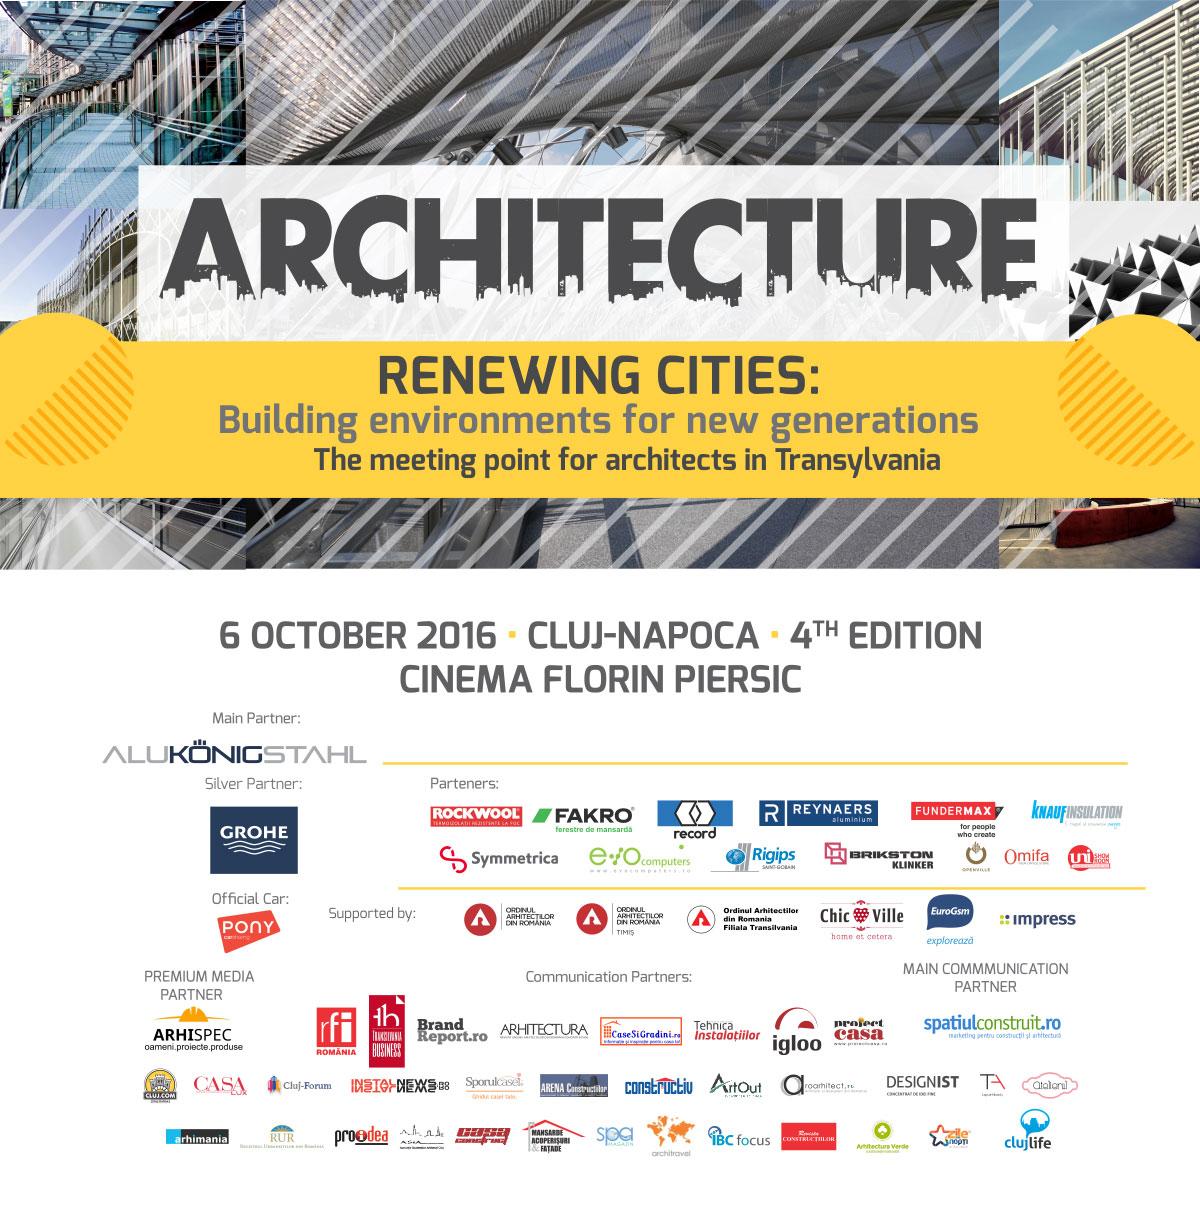 architecture-macheta-online-2